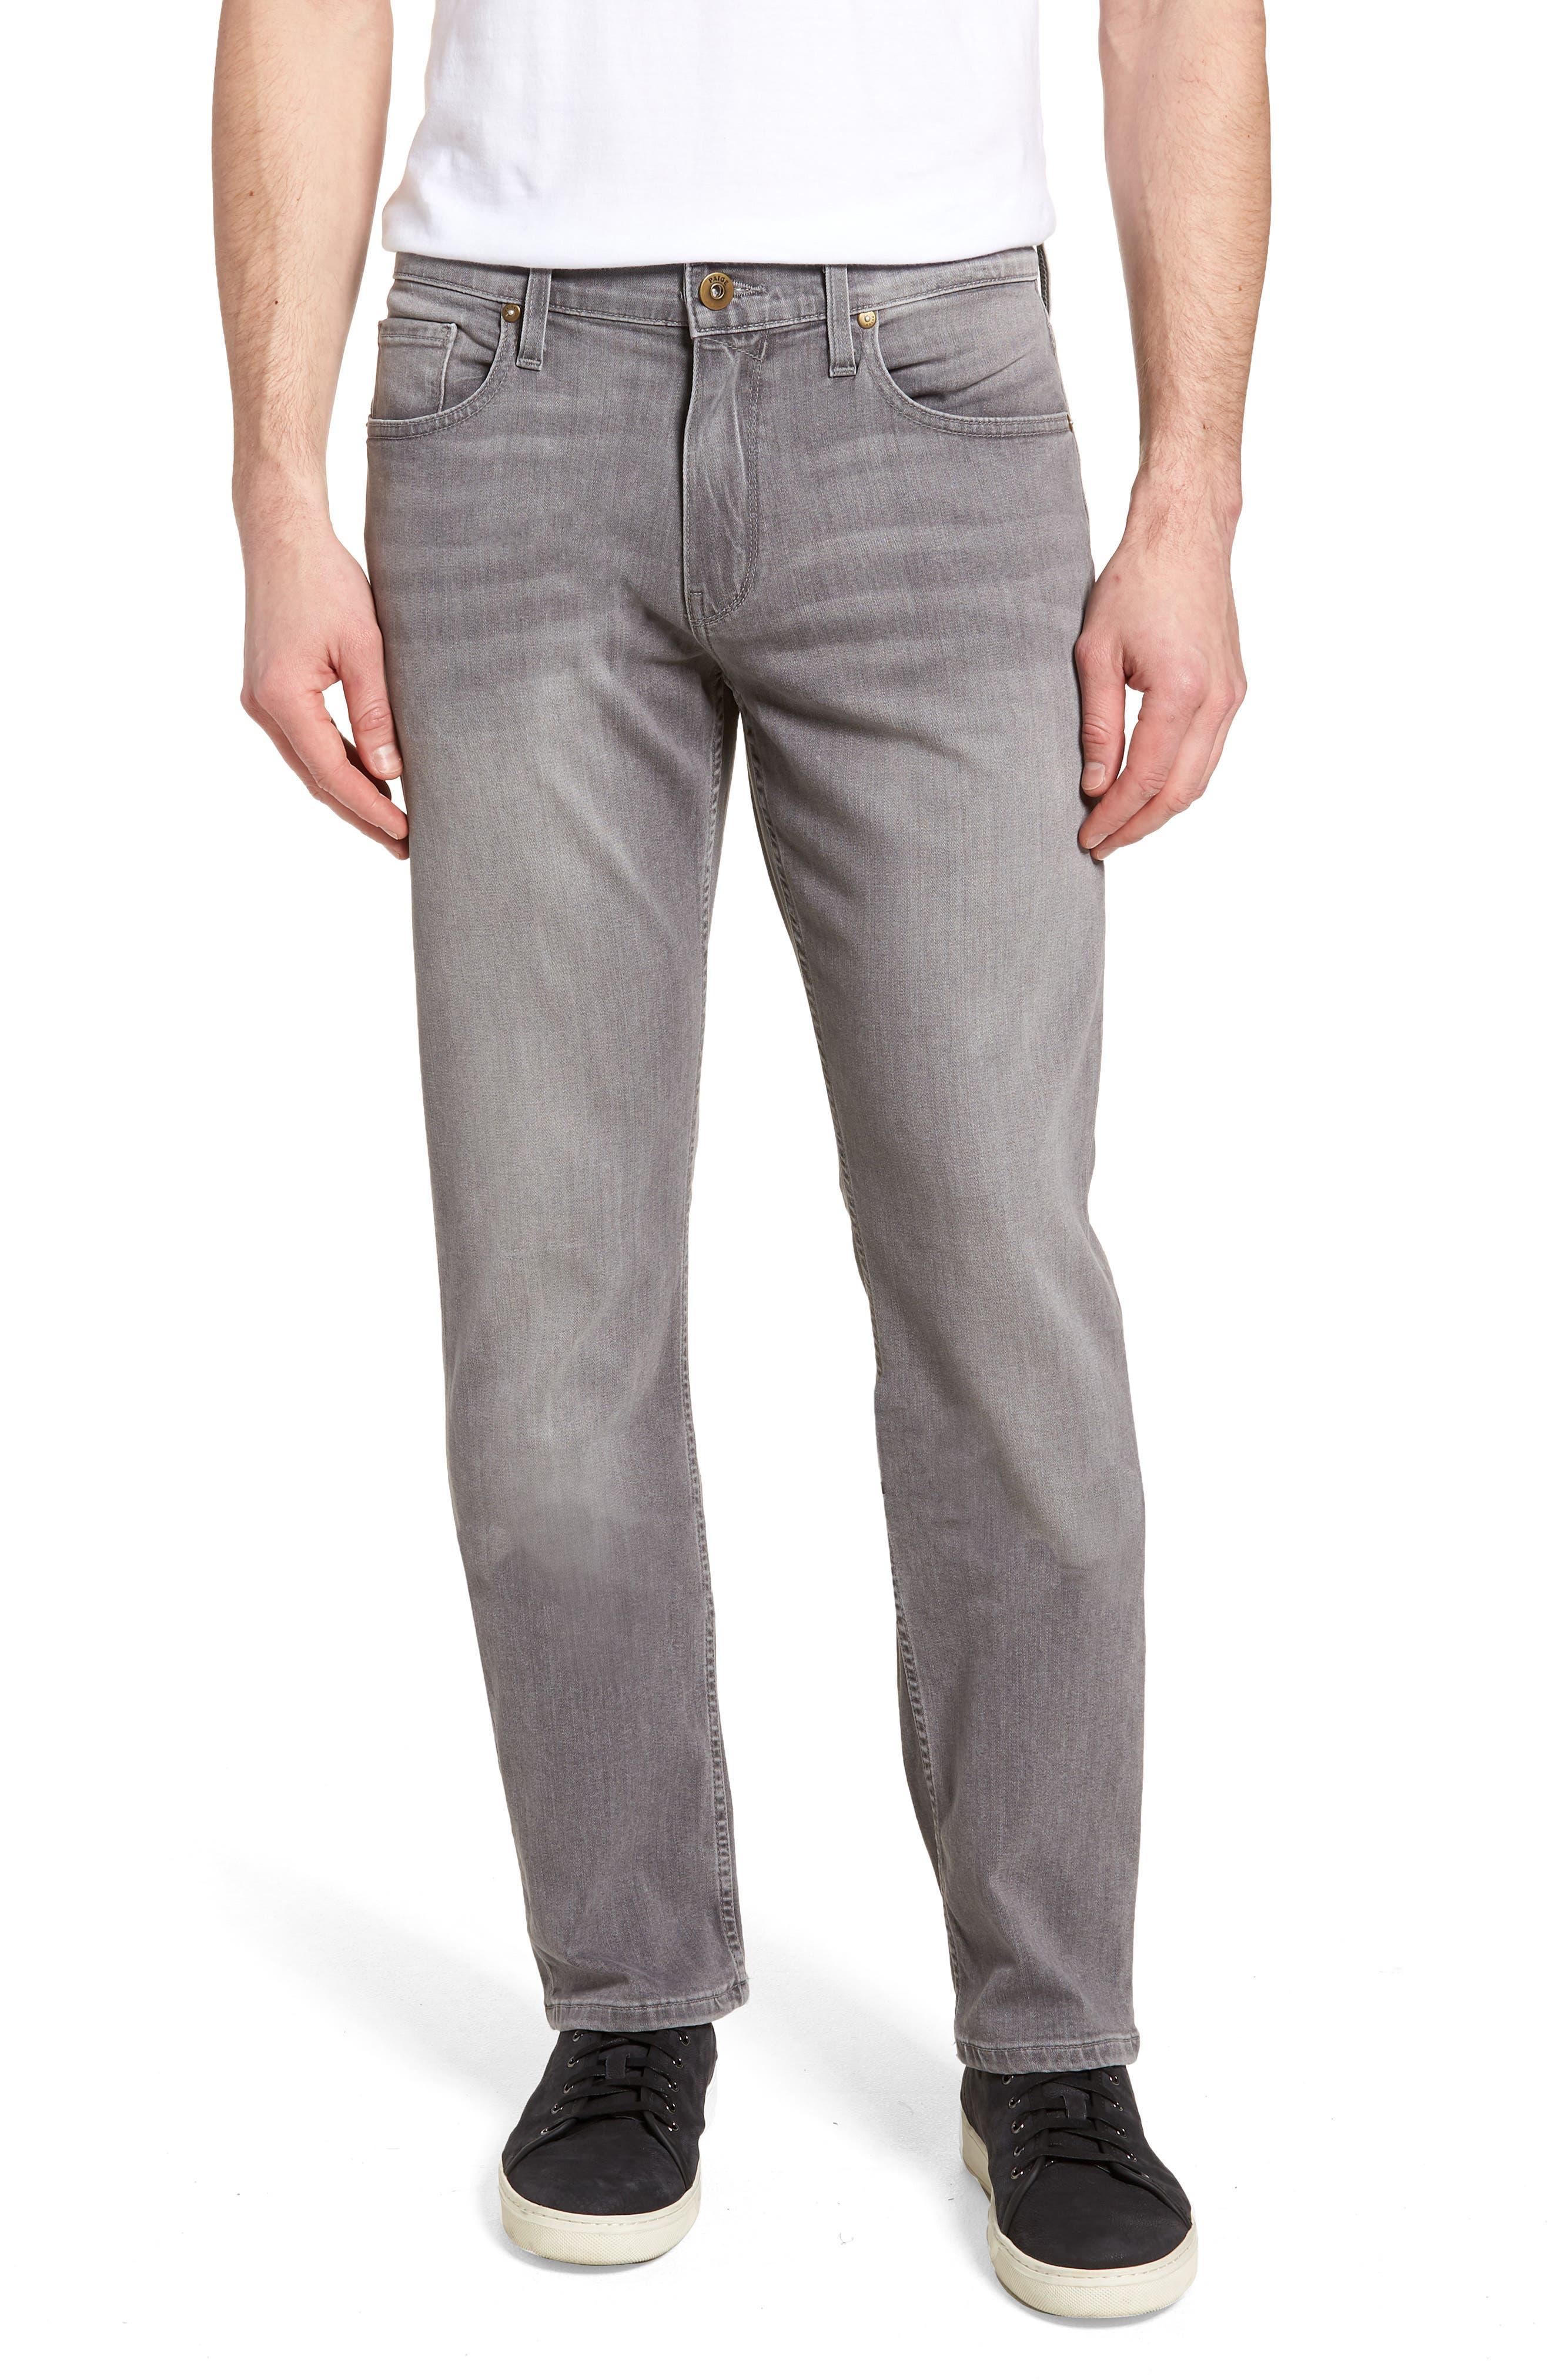 Normandie Straight Leg Jeans,                         Main,                         color, 030